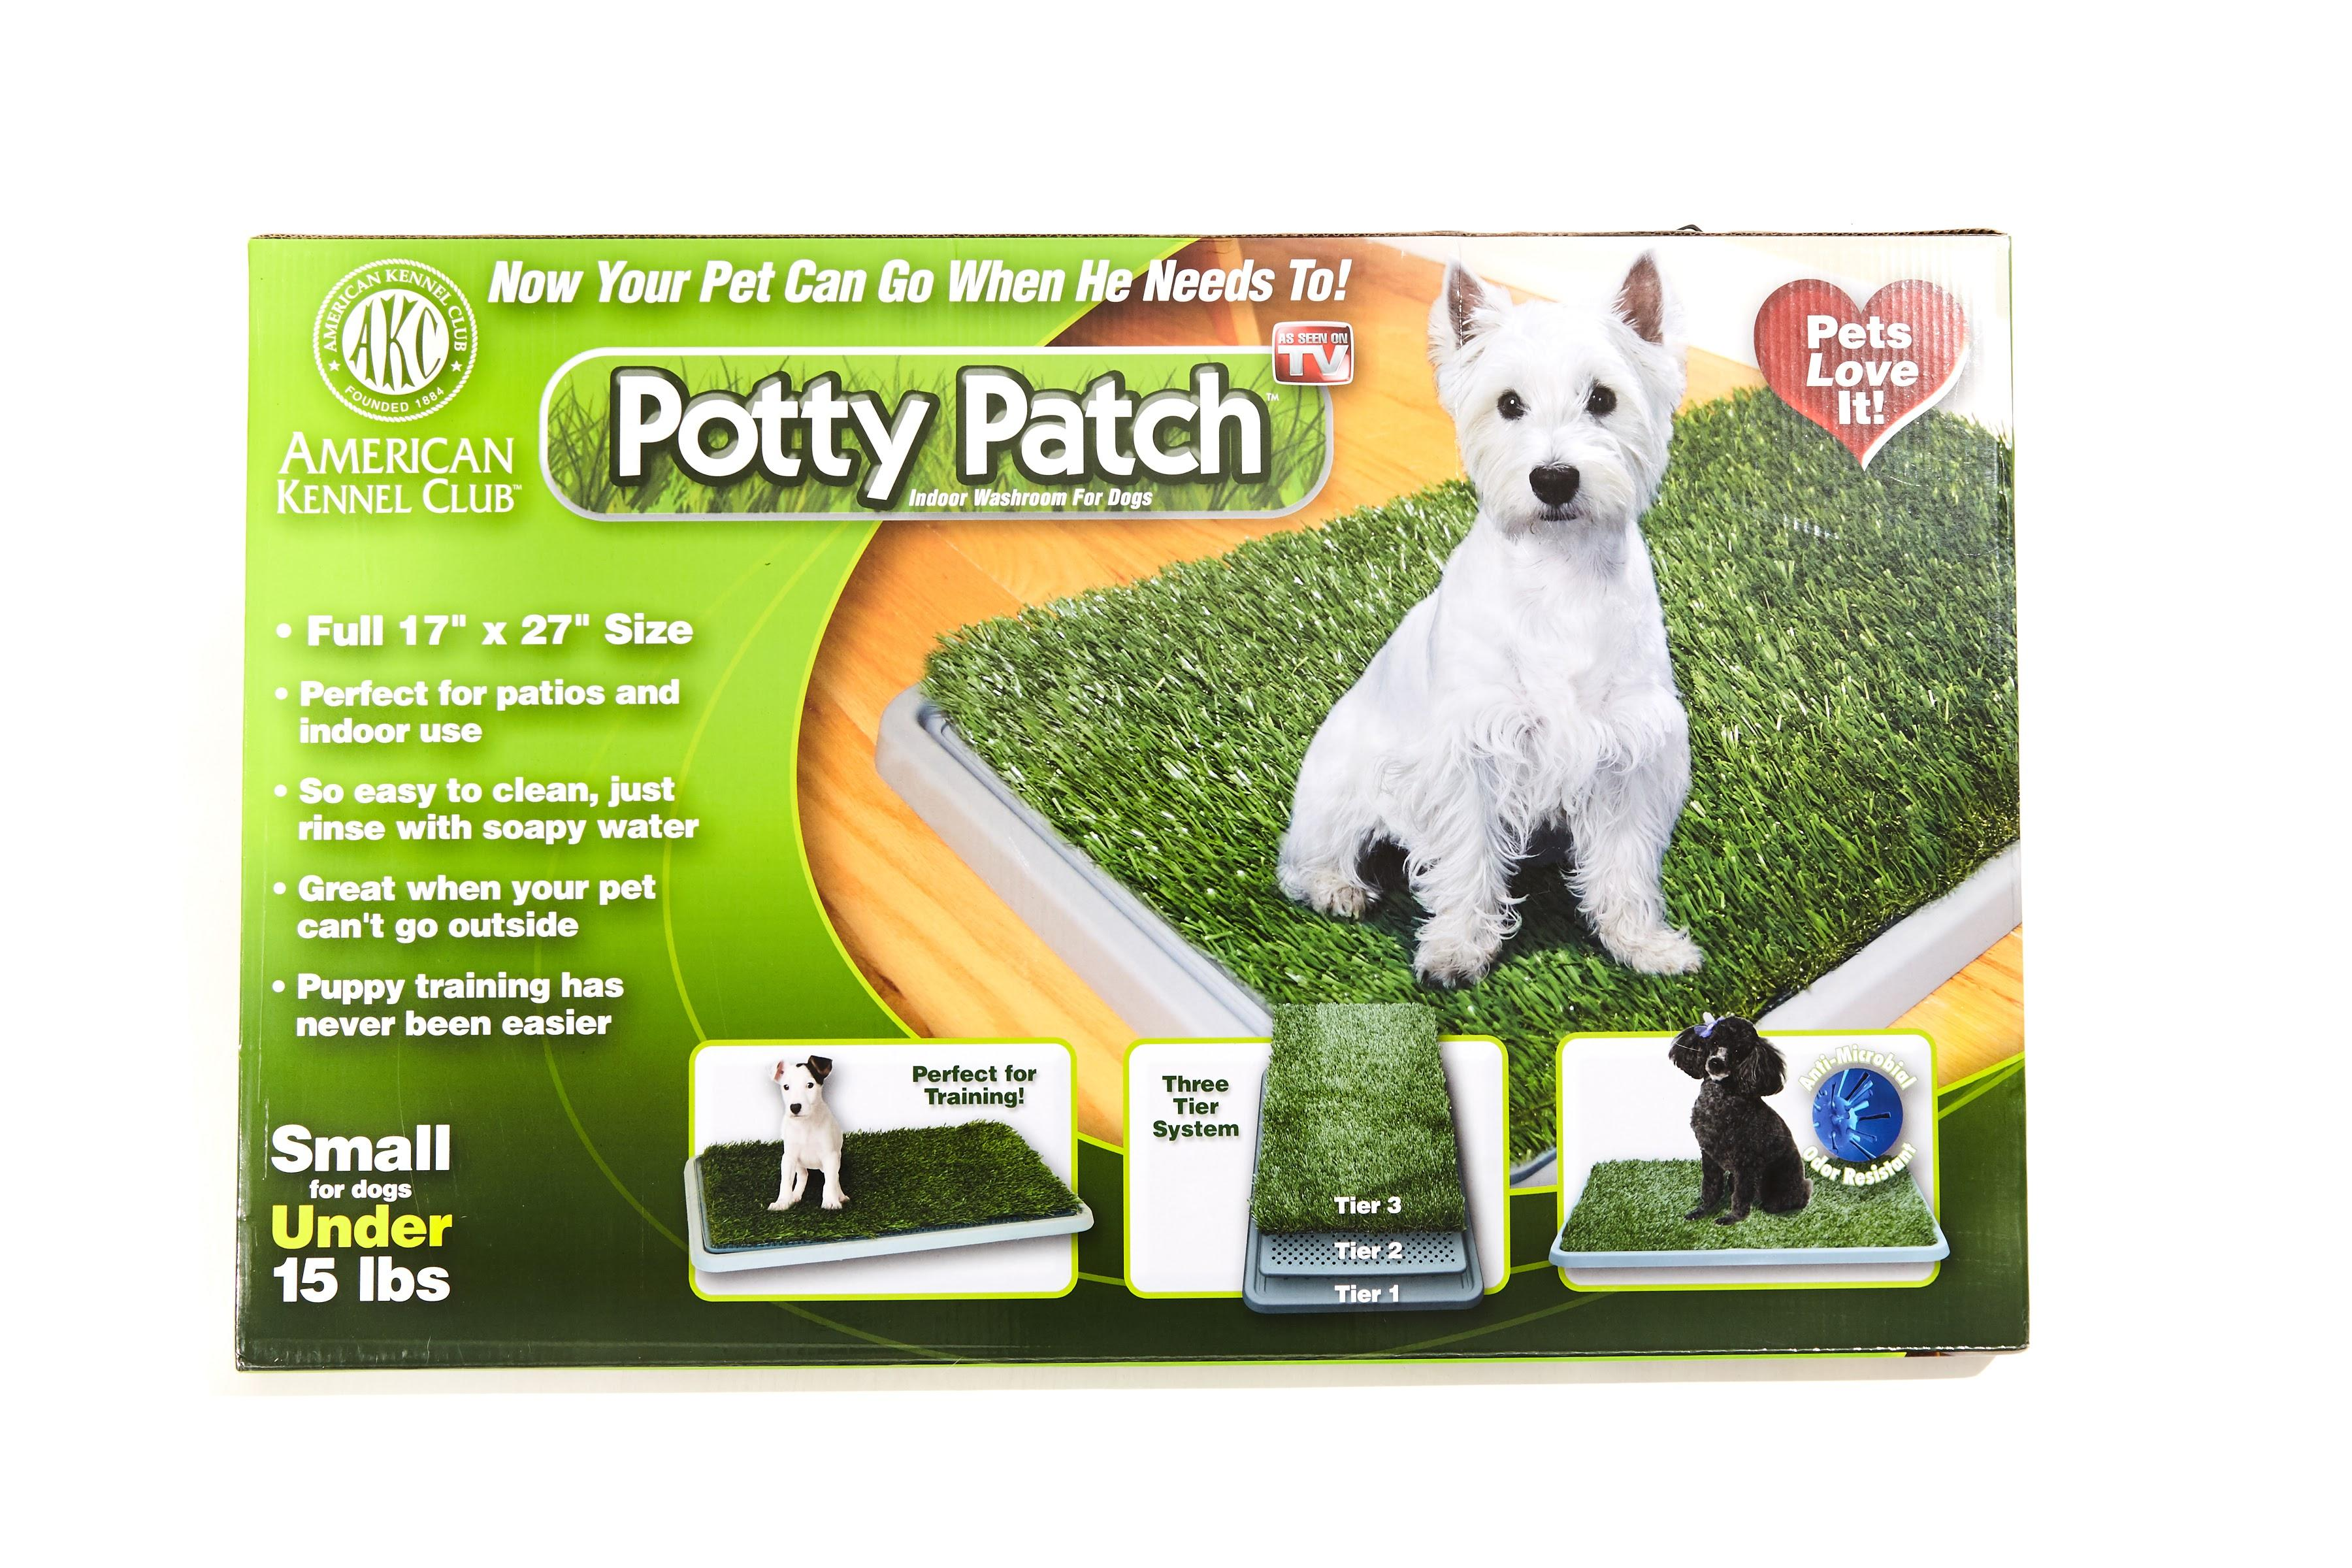 Amazon Potty Patch Economical Dog Litter Box and Grass